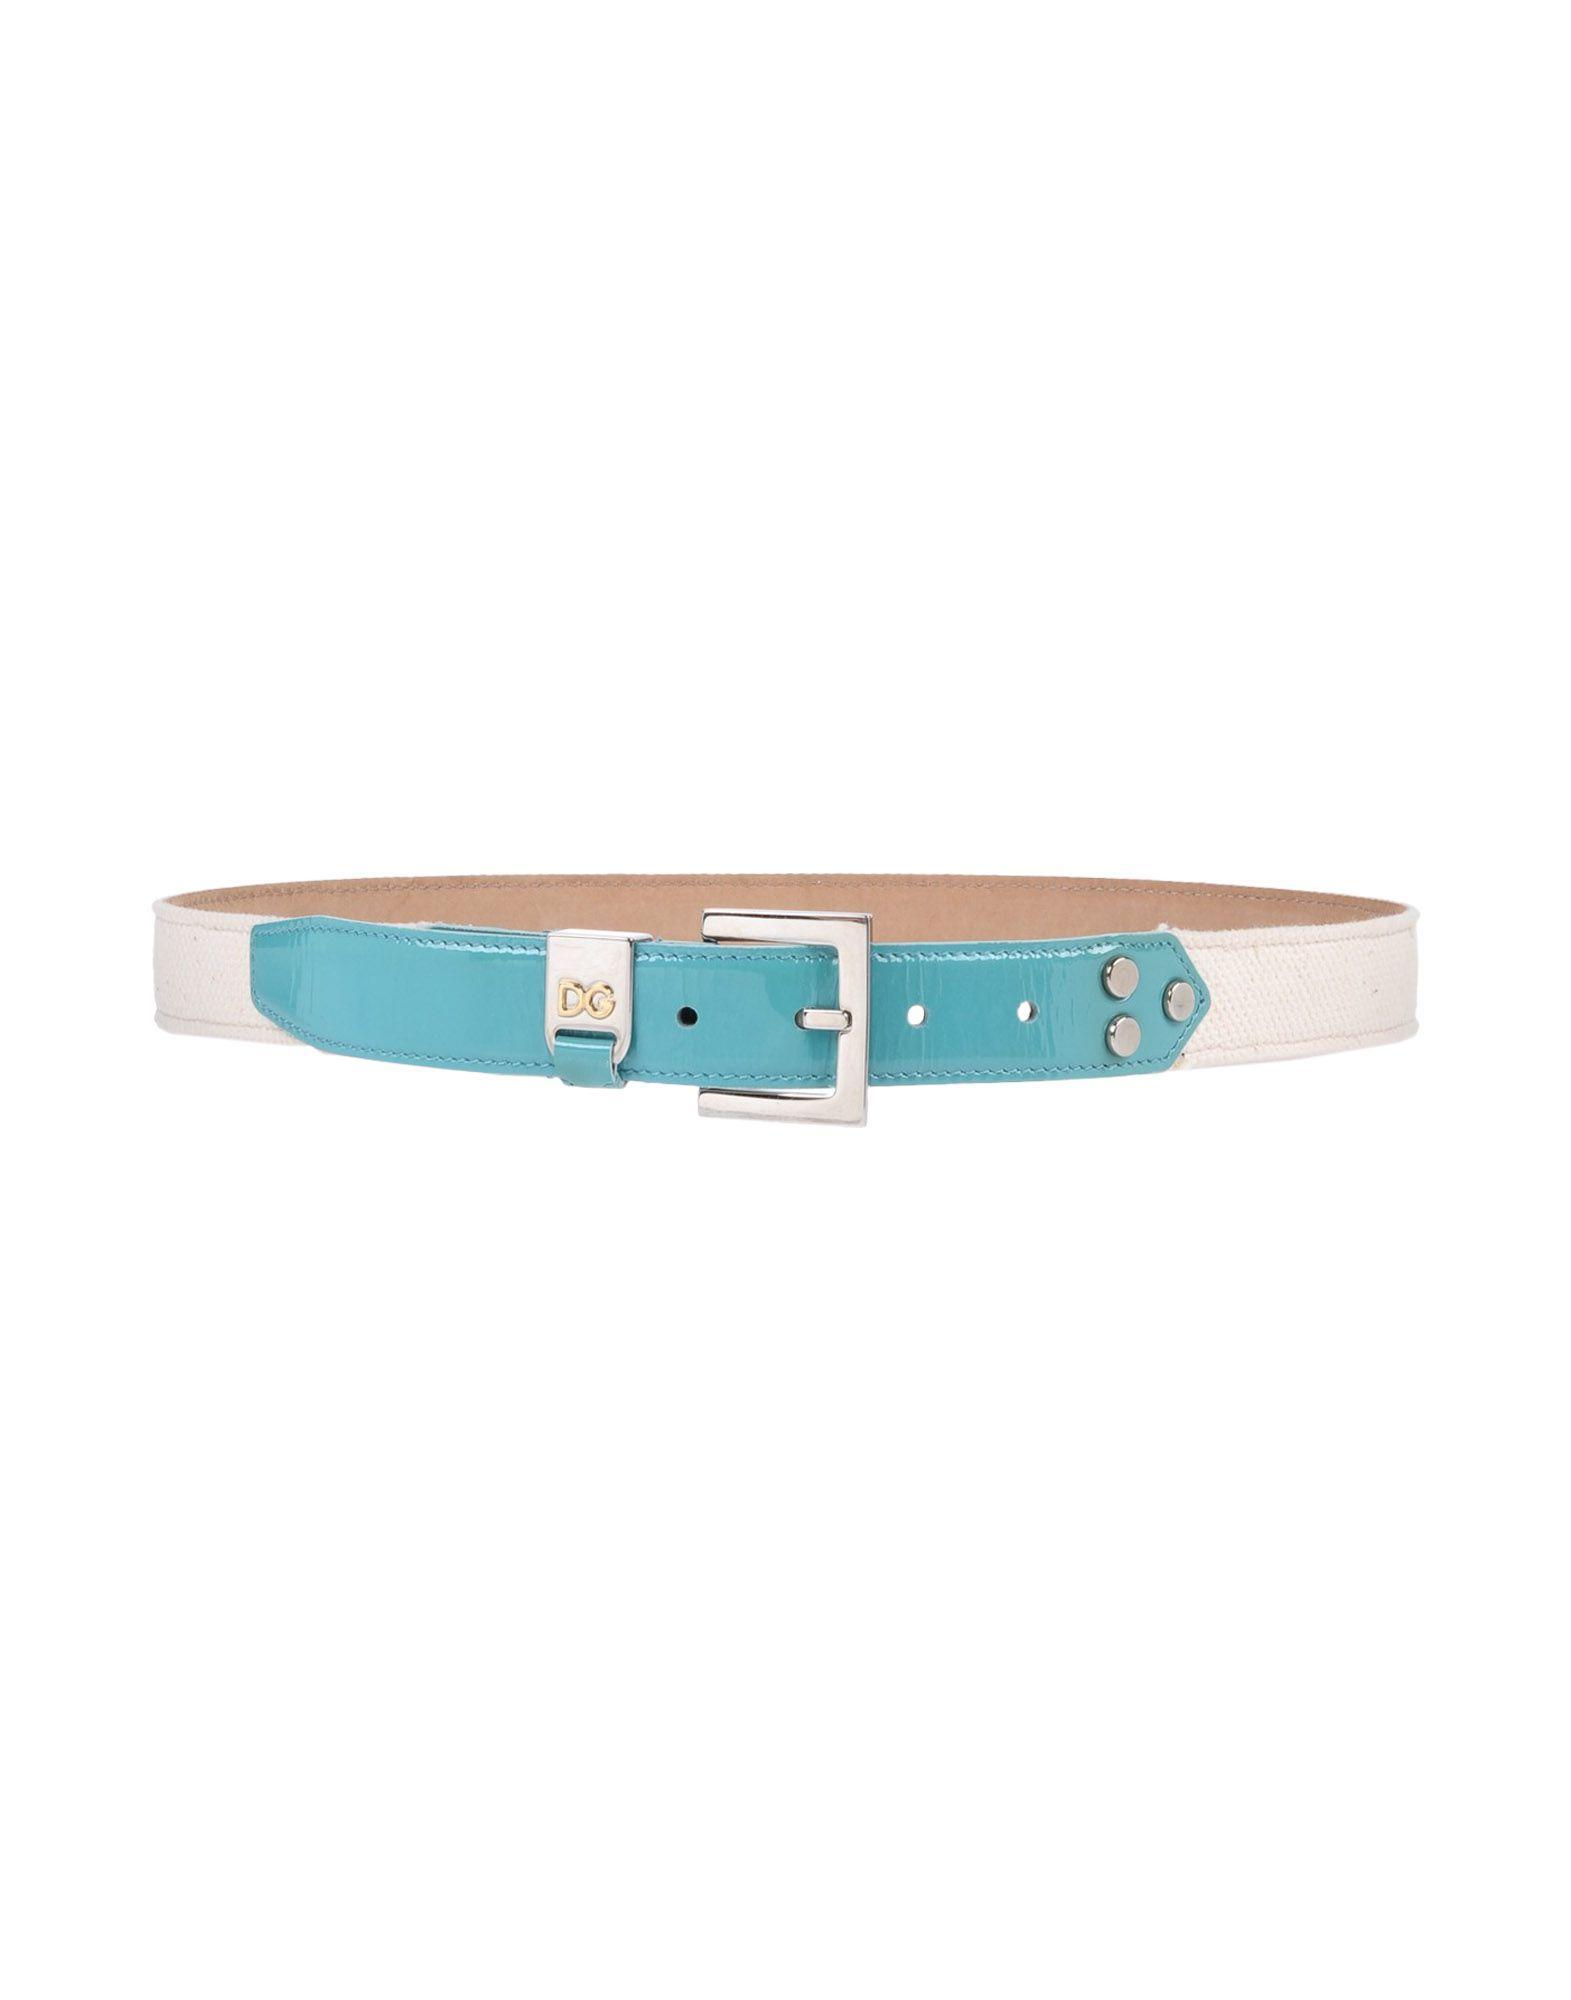 Dolce & Gabbana Belts In Light Green